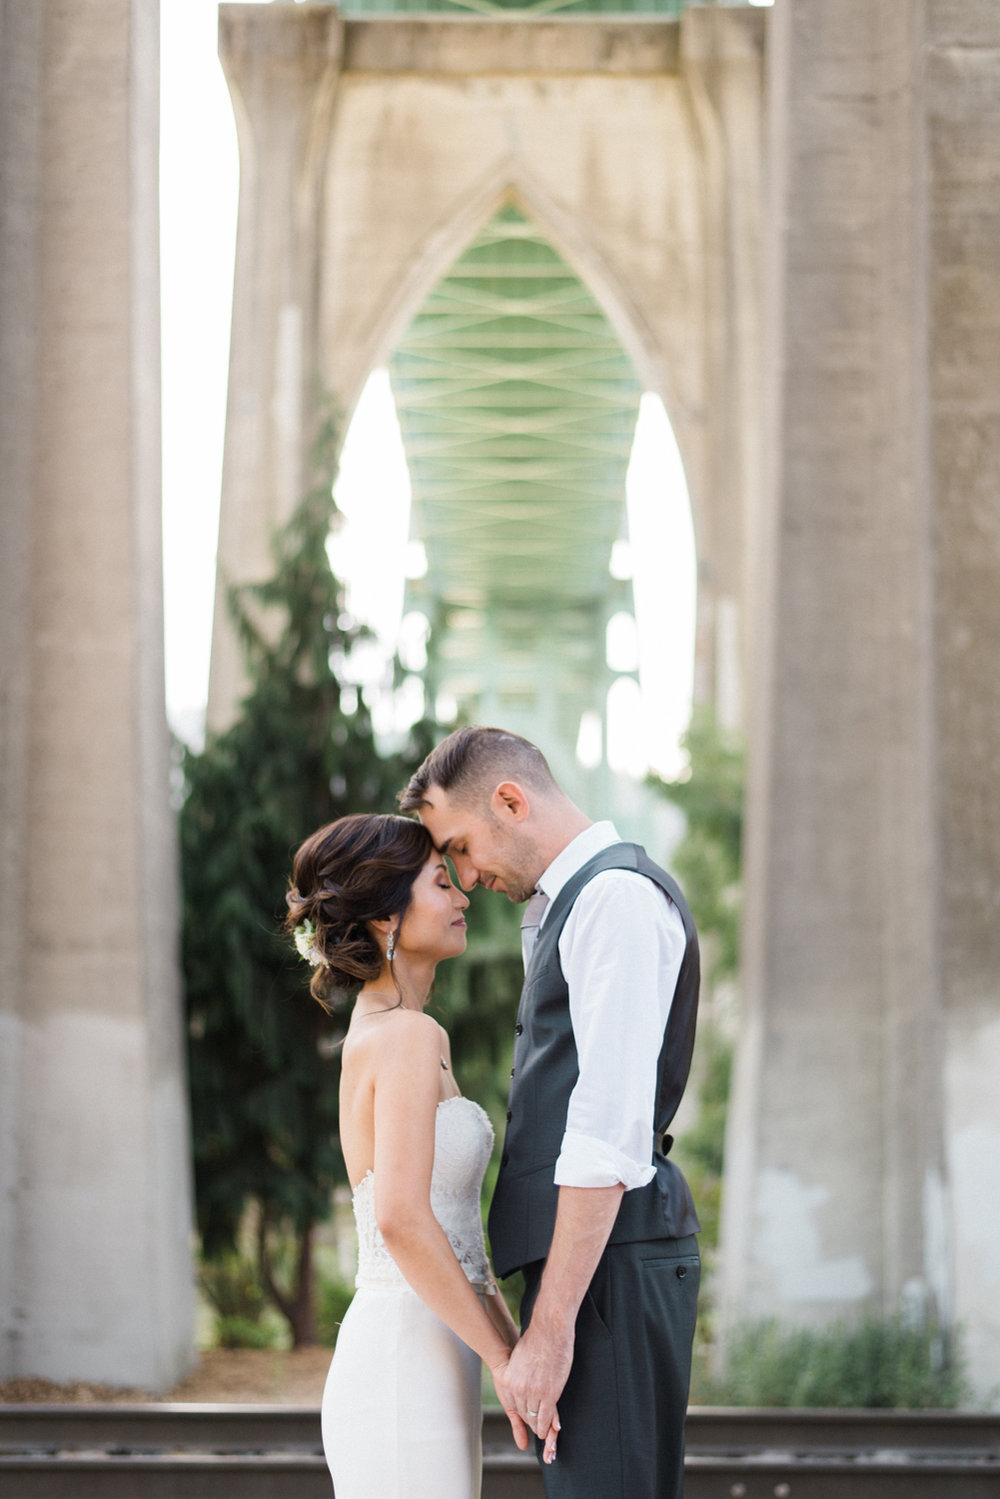 cathedral-park-wedding-st-johns-bridge-portland-shelley-marie-photo-3.jpg